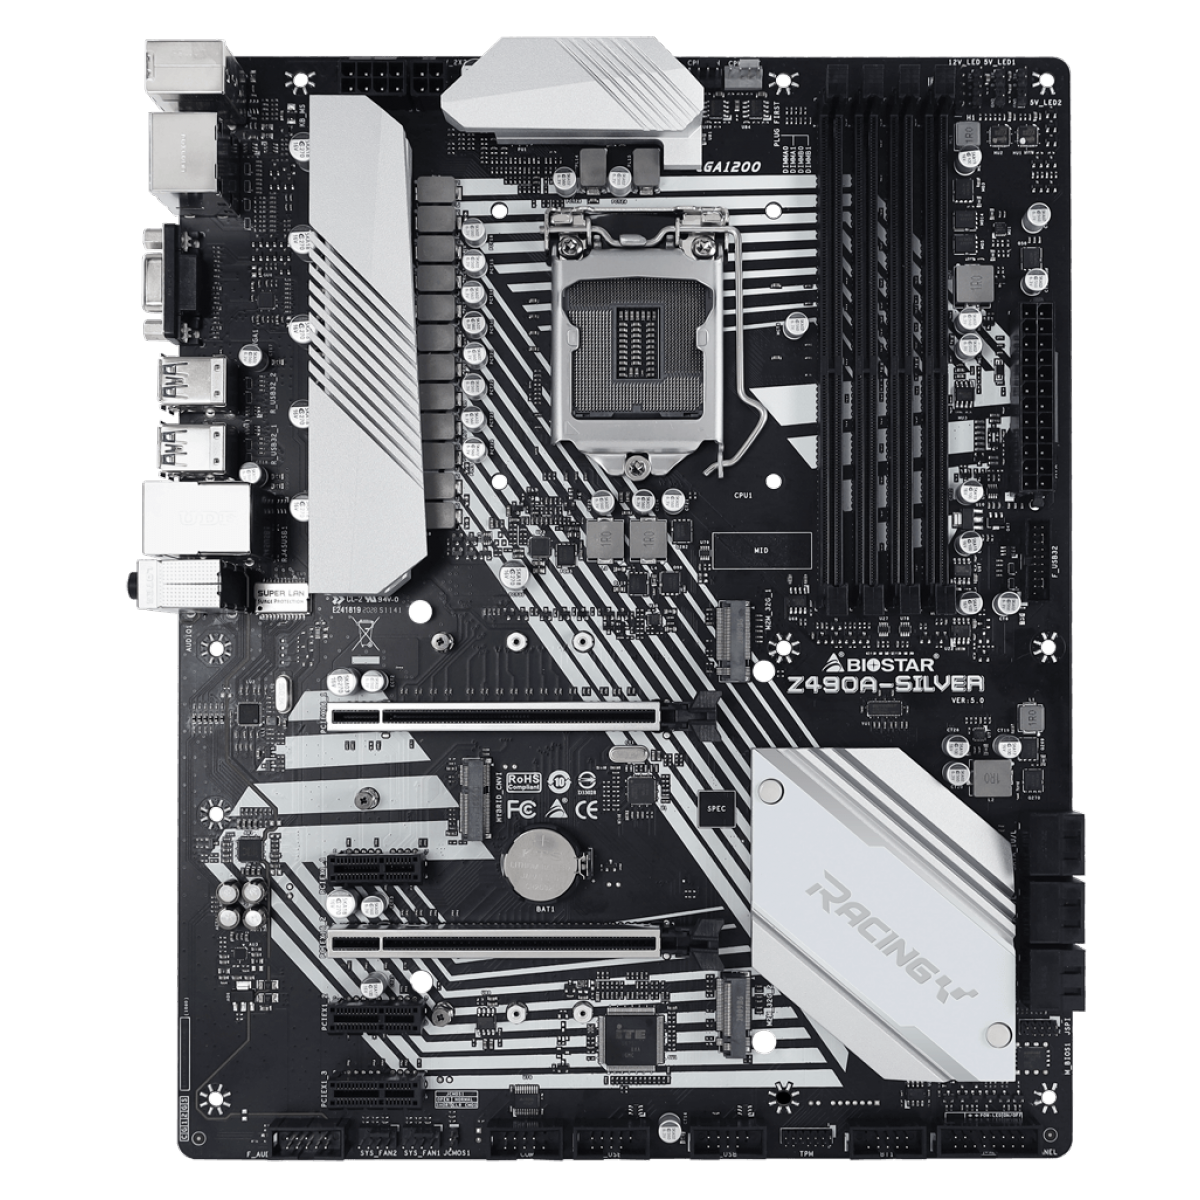 Placa Mãe Biostar Racing Z490A-Silver, Chipset Z490, Intel LGA 1200, ATX, DDR4, IZ49CAHT-R01-BS210X